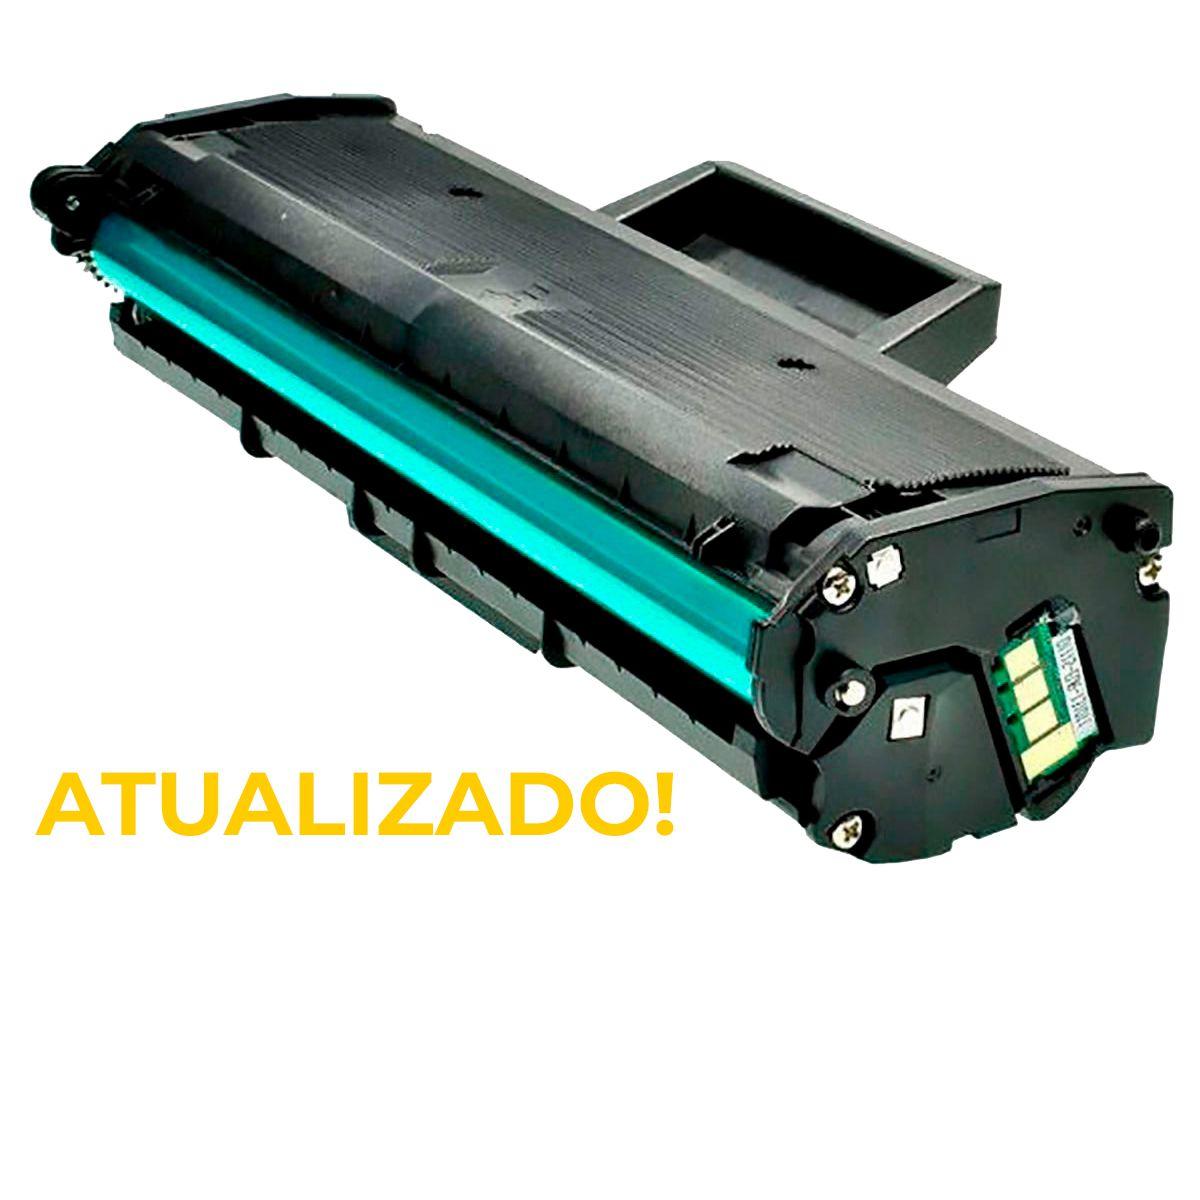 Toner Compatível Samsung MLT-D111S D111S | M2020 M2020FW M2070 M2070W M2070FW **Atualizado**